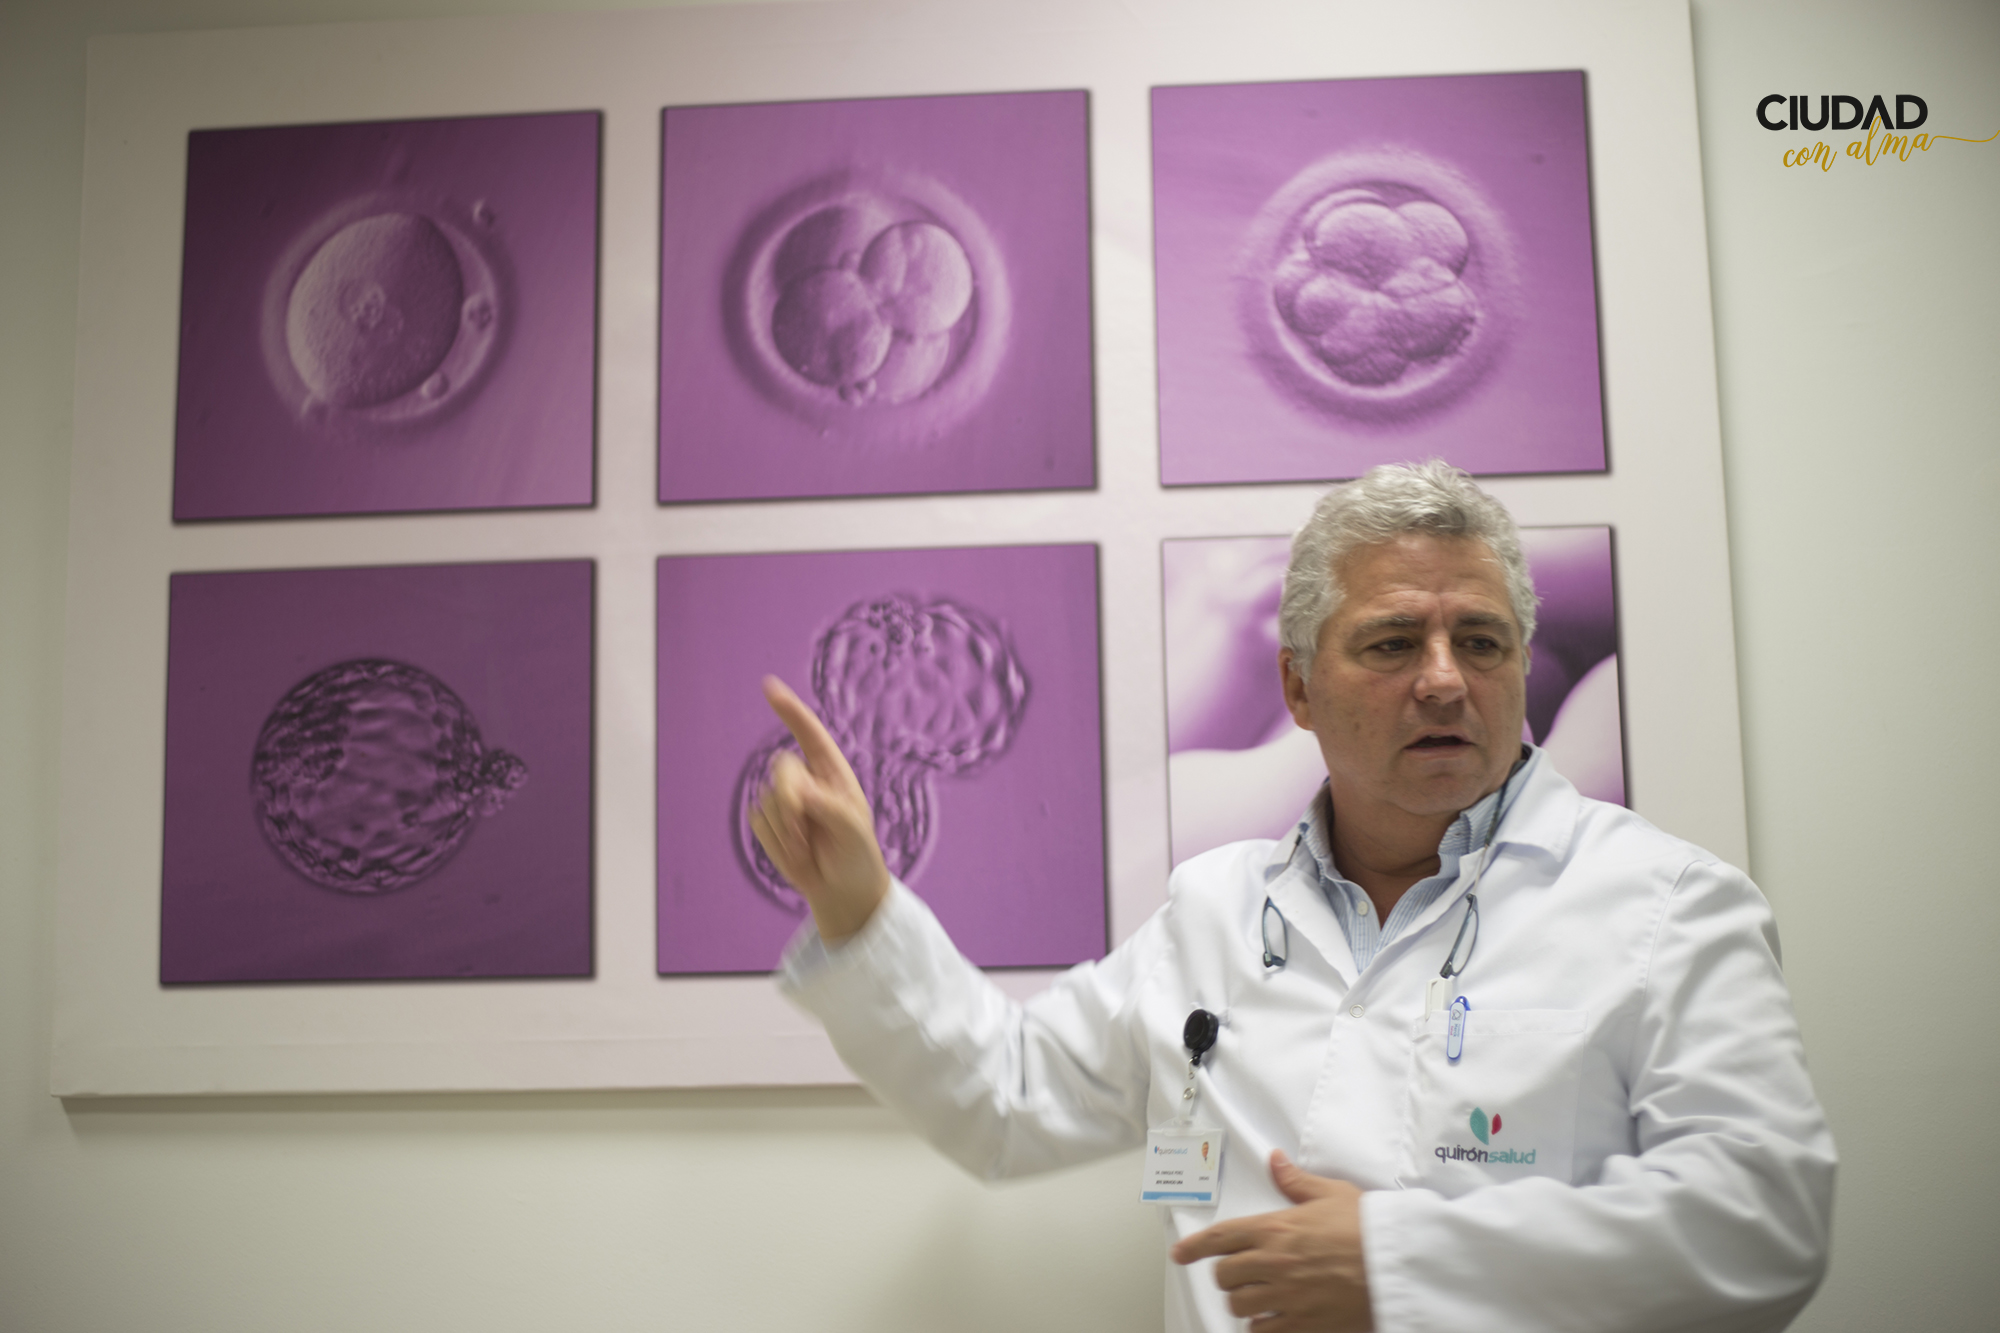 vitrificacion ovulos fertilidad quiron malaga